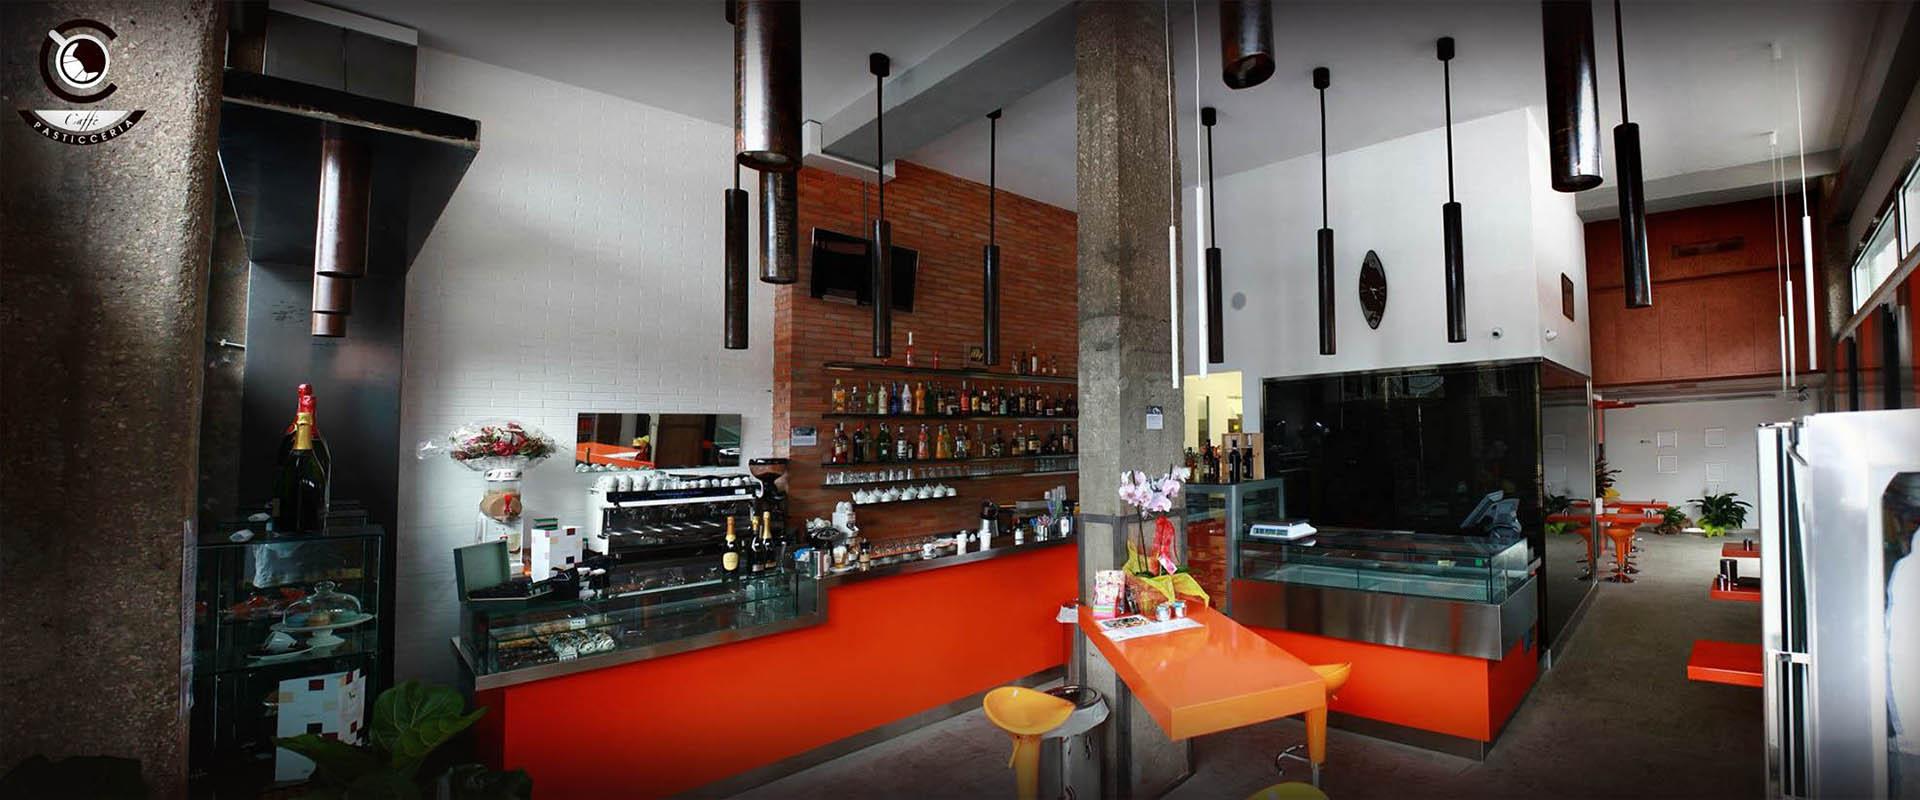 aironic_architettura_design_interior_caffe_crem_grosseto